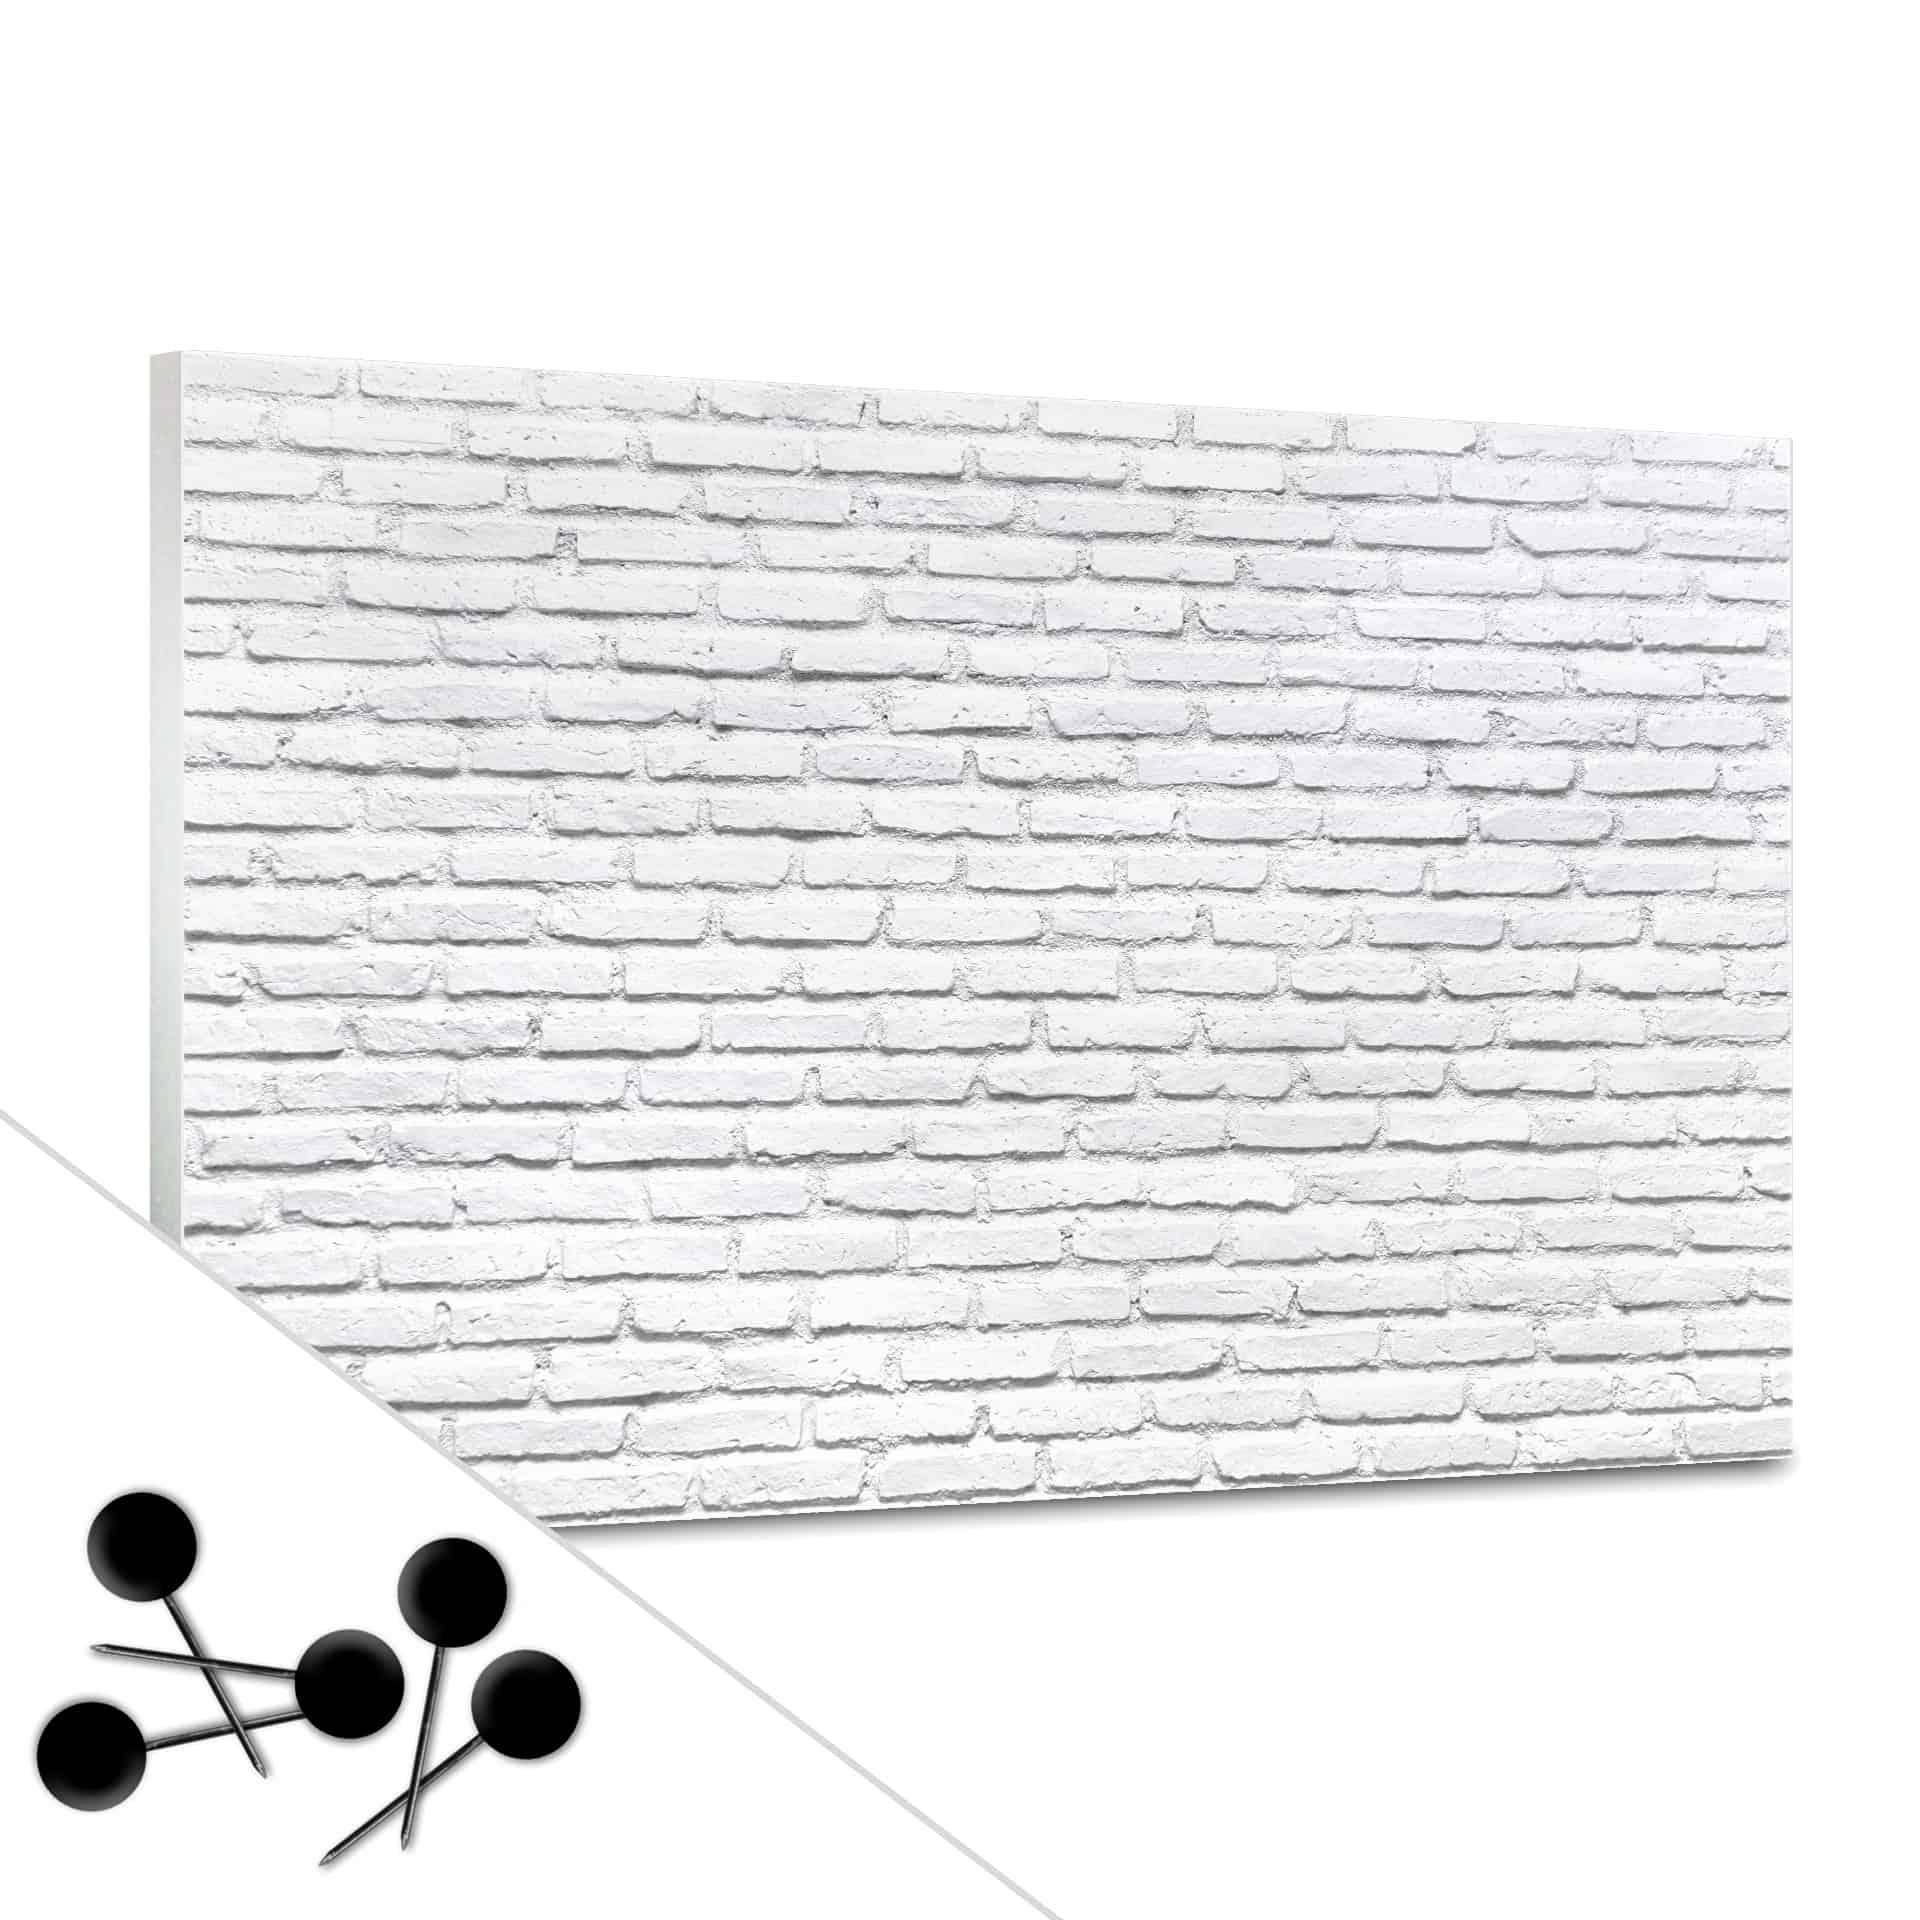 Pinnwand Pinnwand Weißer Backstein inkl 5 Pinnadeln grau WANDDEKO Ordnung